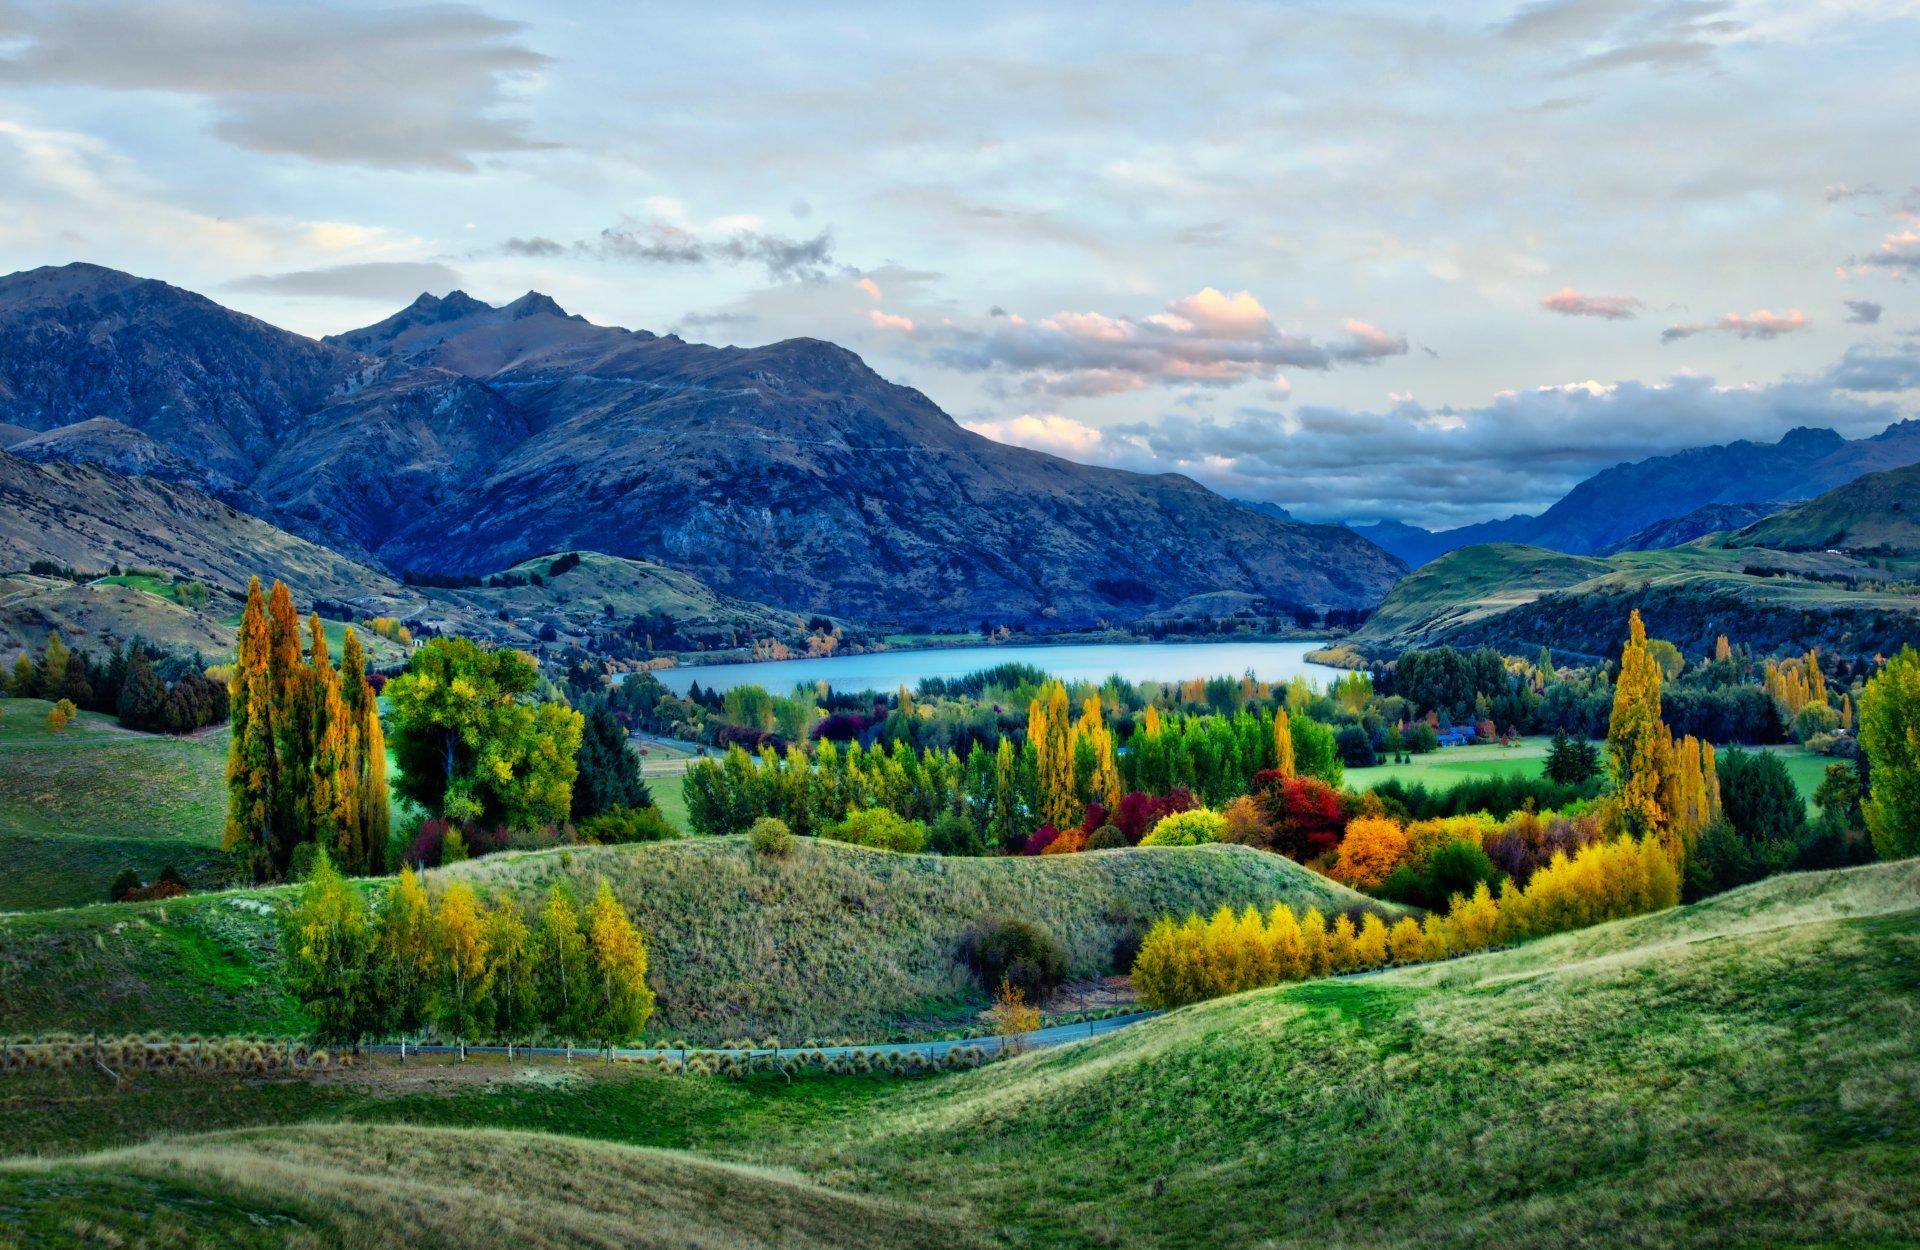 terre nature paysage alaska nature - photo #4